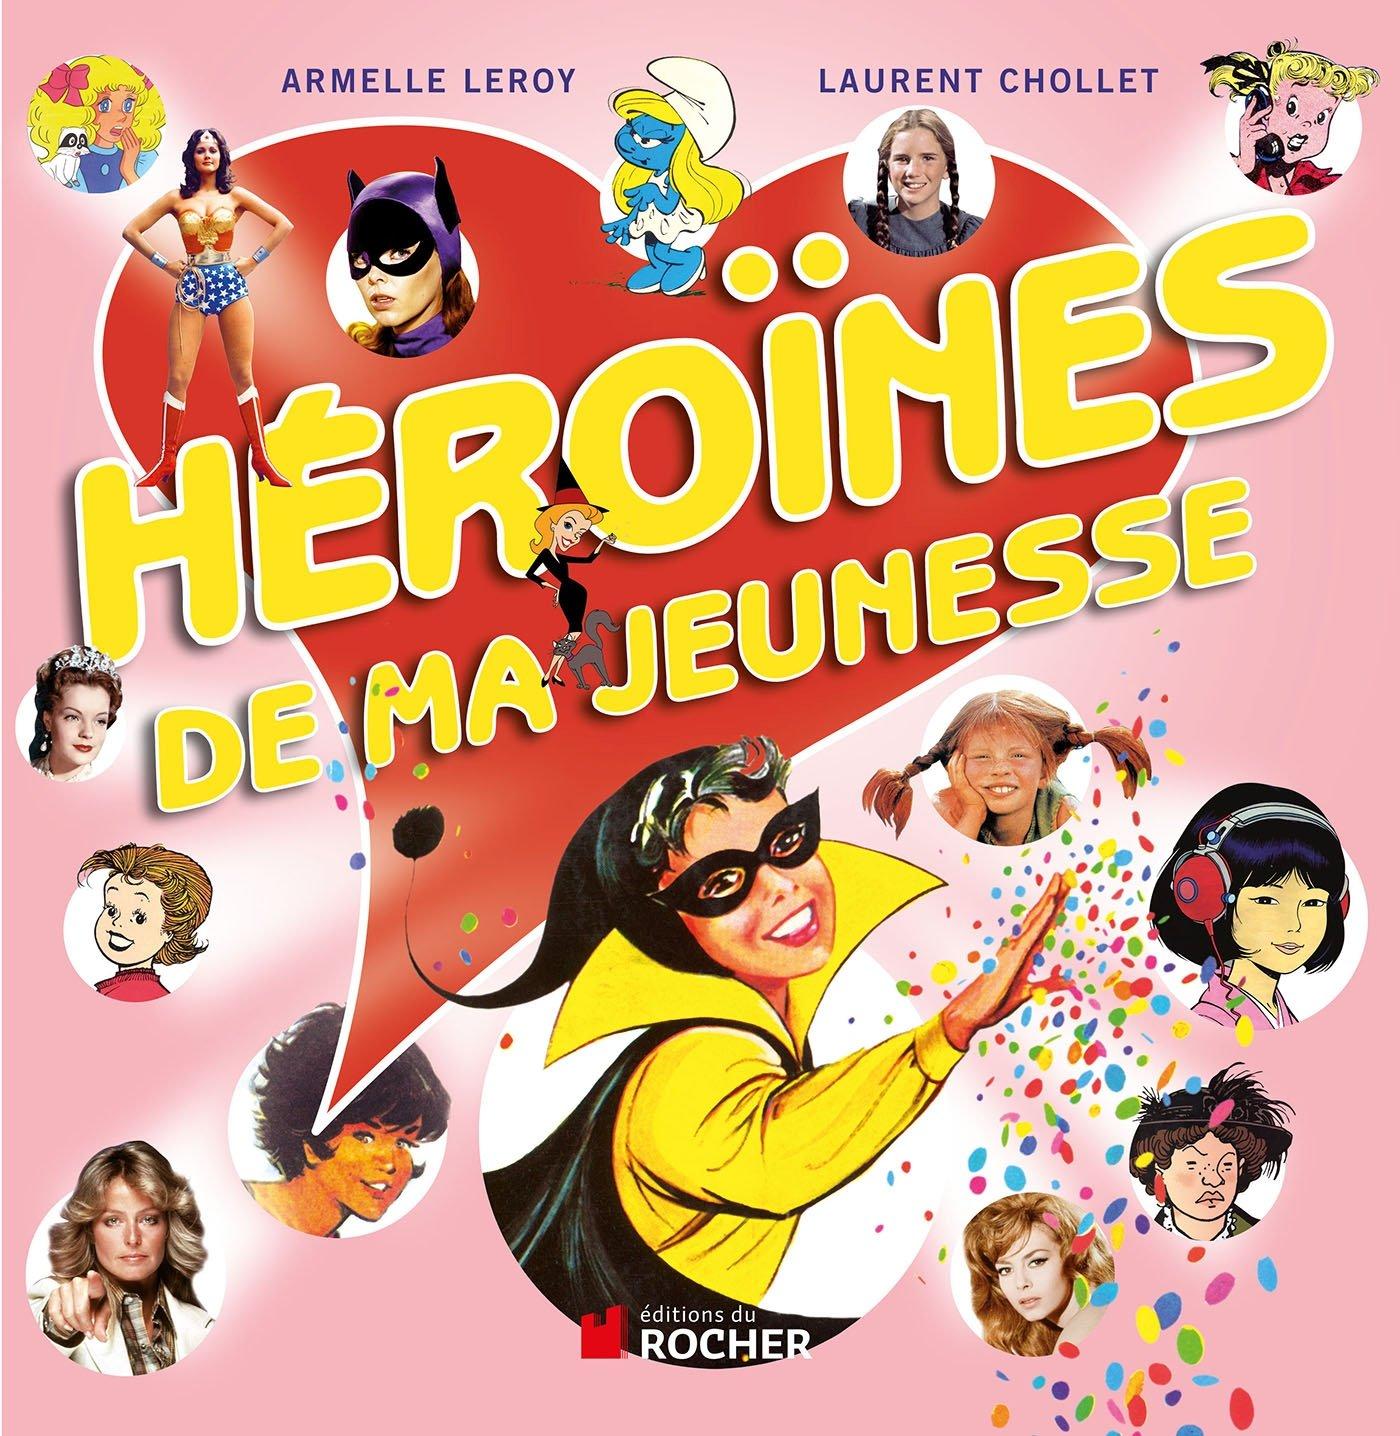 Héroïnes de ma jeunesse por Laurent Chollet